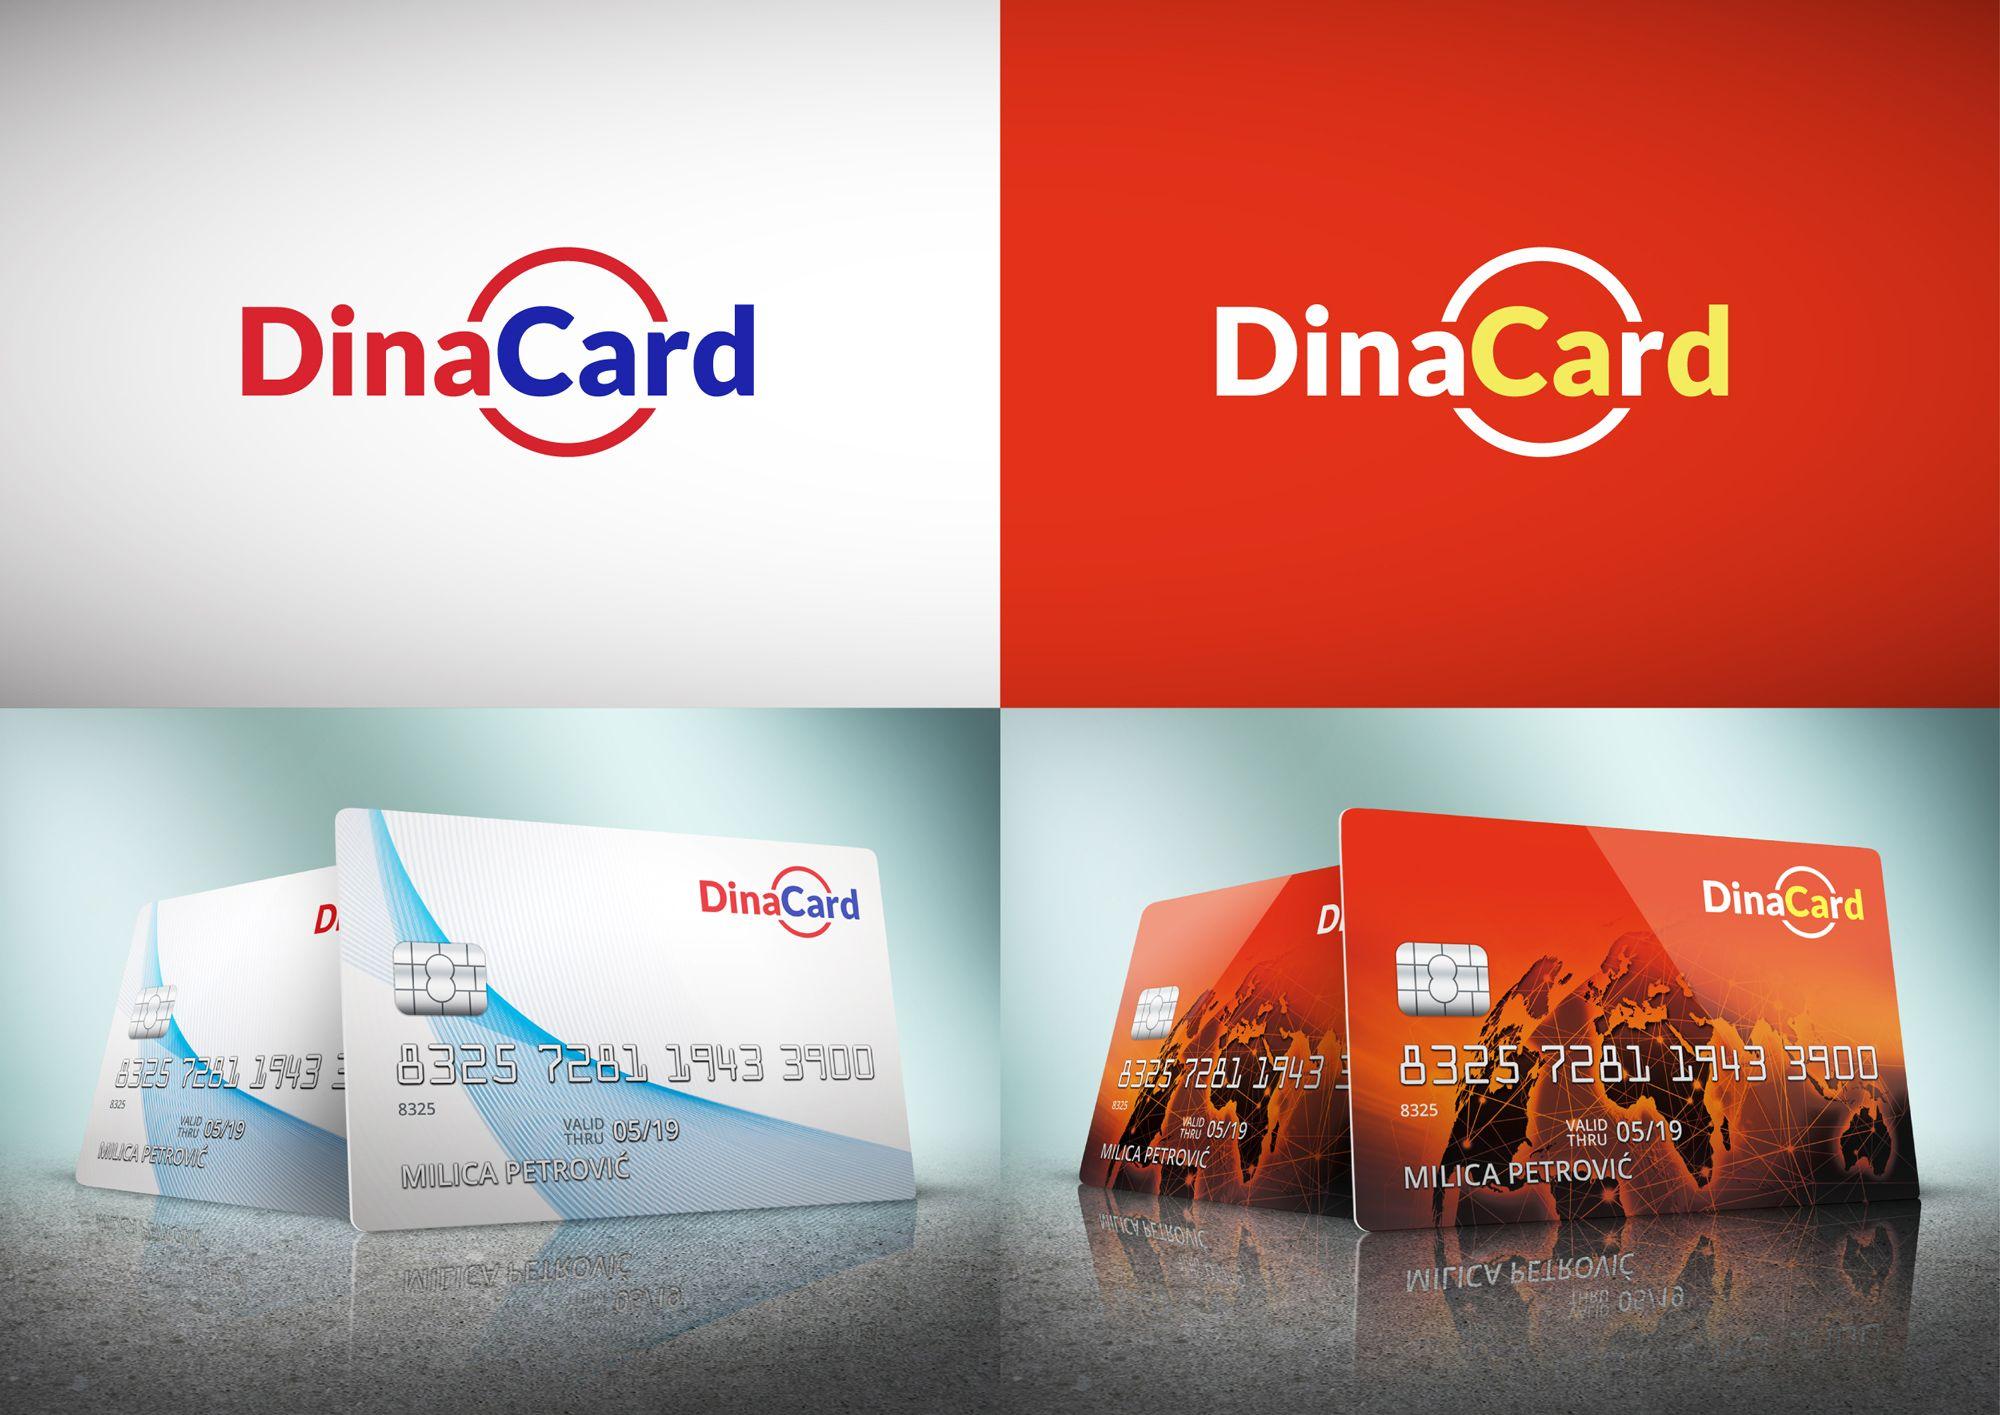 National Bank of Serbia payment card design Nacionalna Banka Srbije dizajn platne kartice Dina online dizajn konkurs Geelancer online design contest